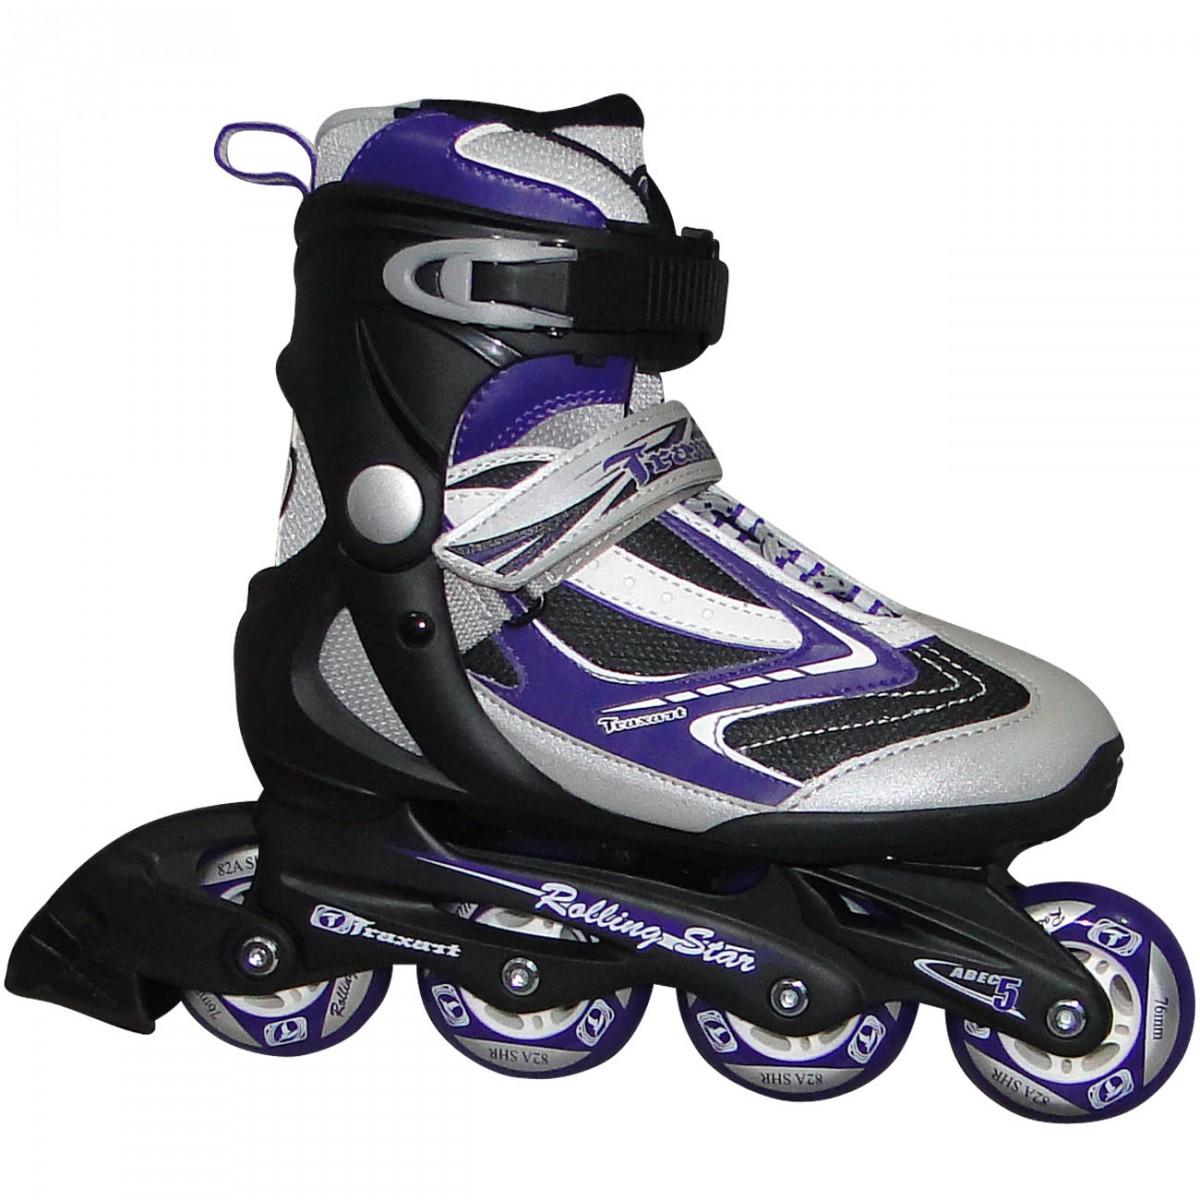 de38061598834 Roller Traxart Rolling Star IN-195 - Preto Uva - Chuteira Nike ...